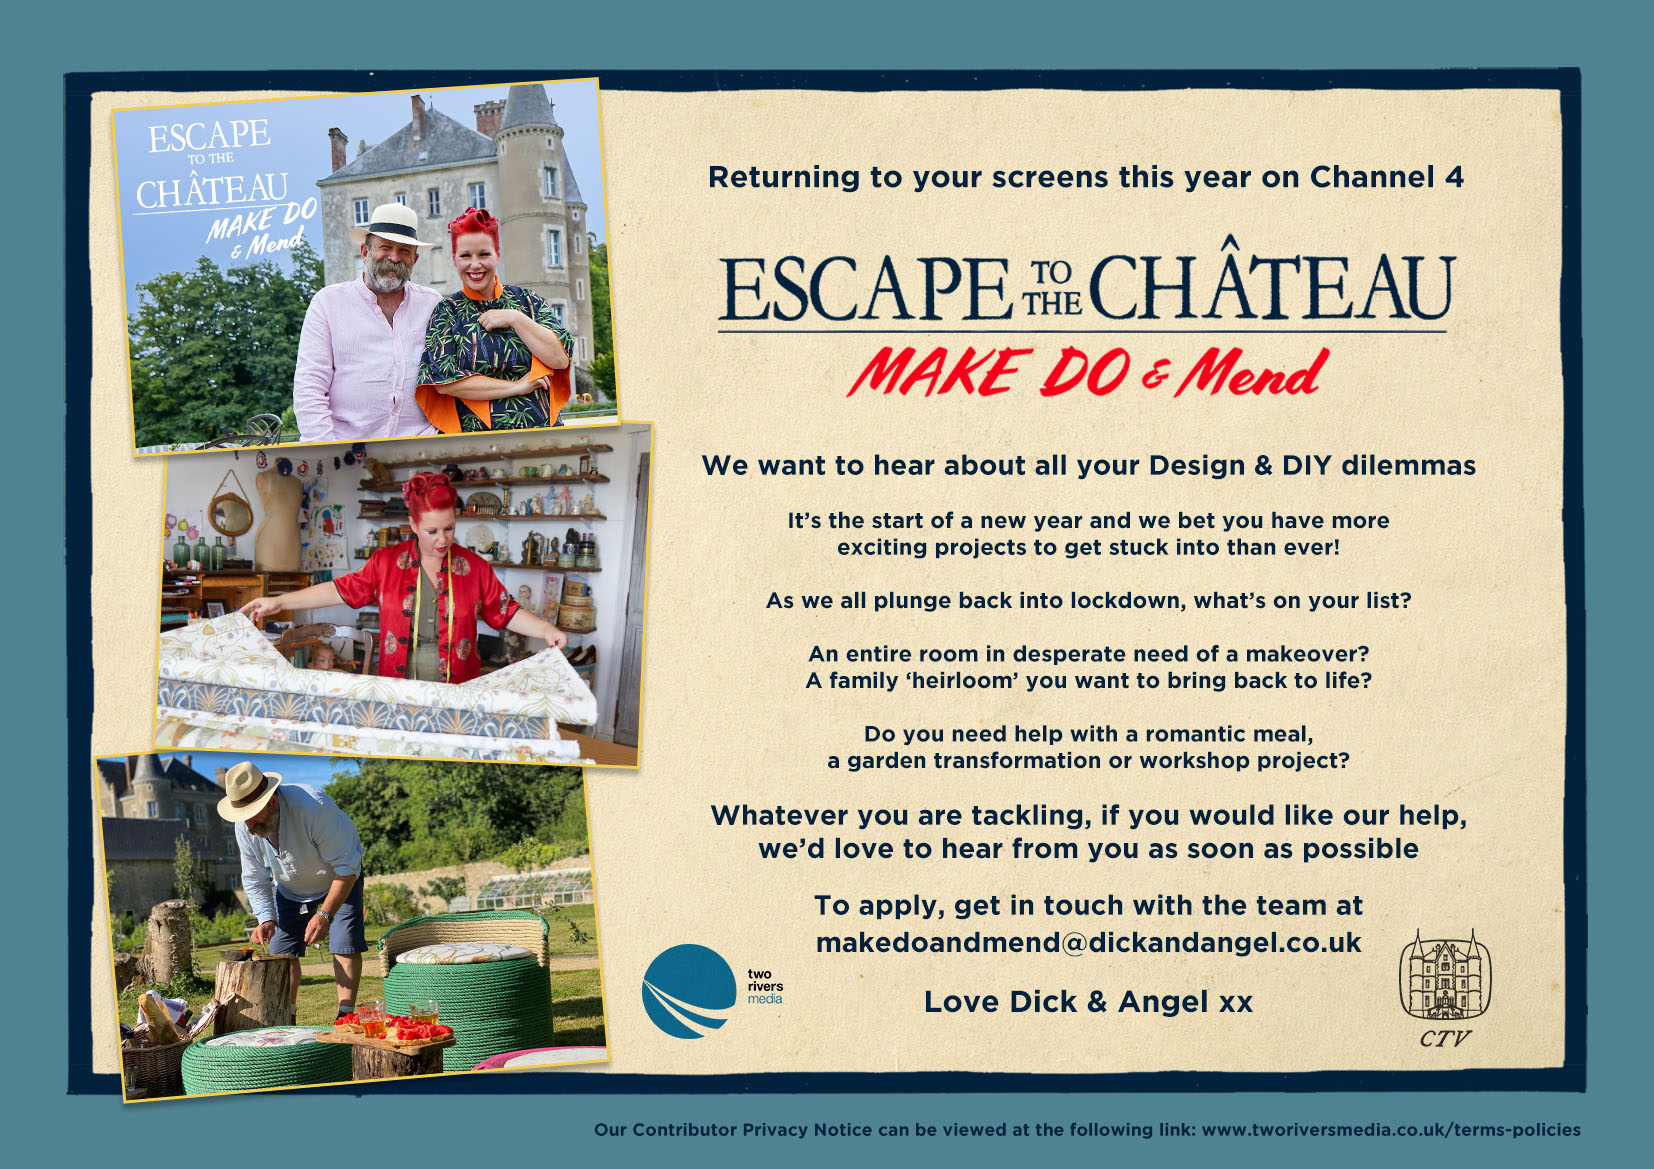 Escape-the-chateau-make-do-and-mend